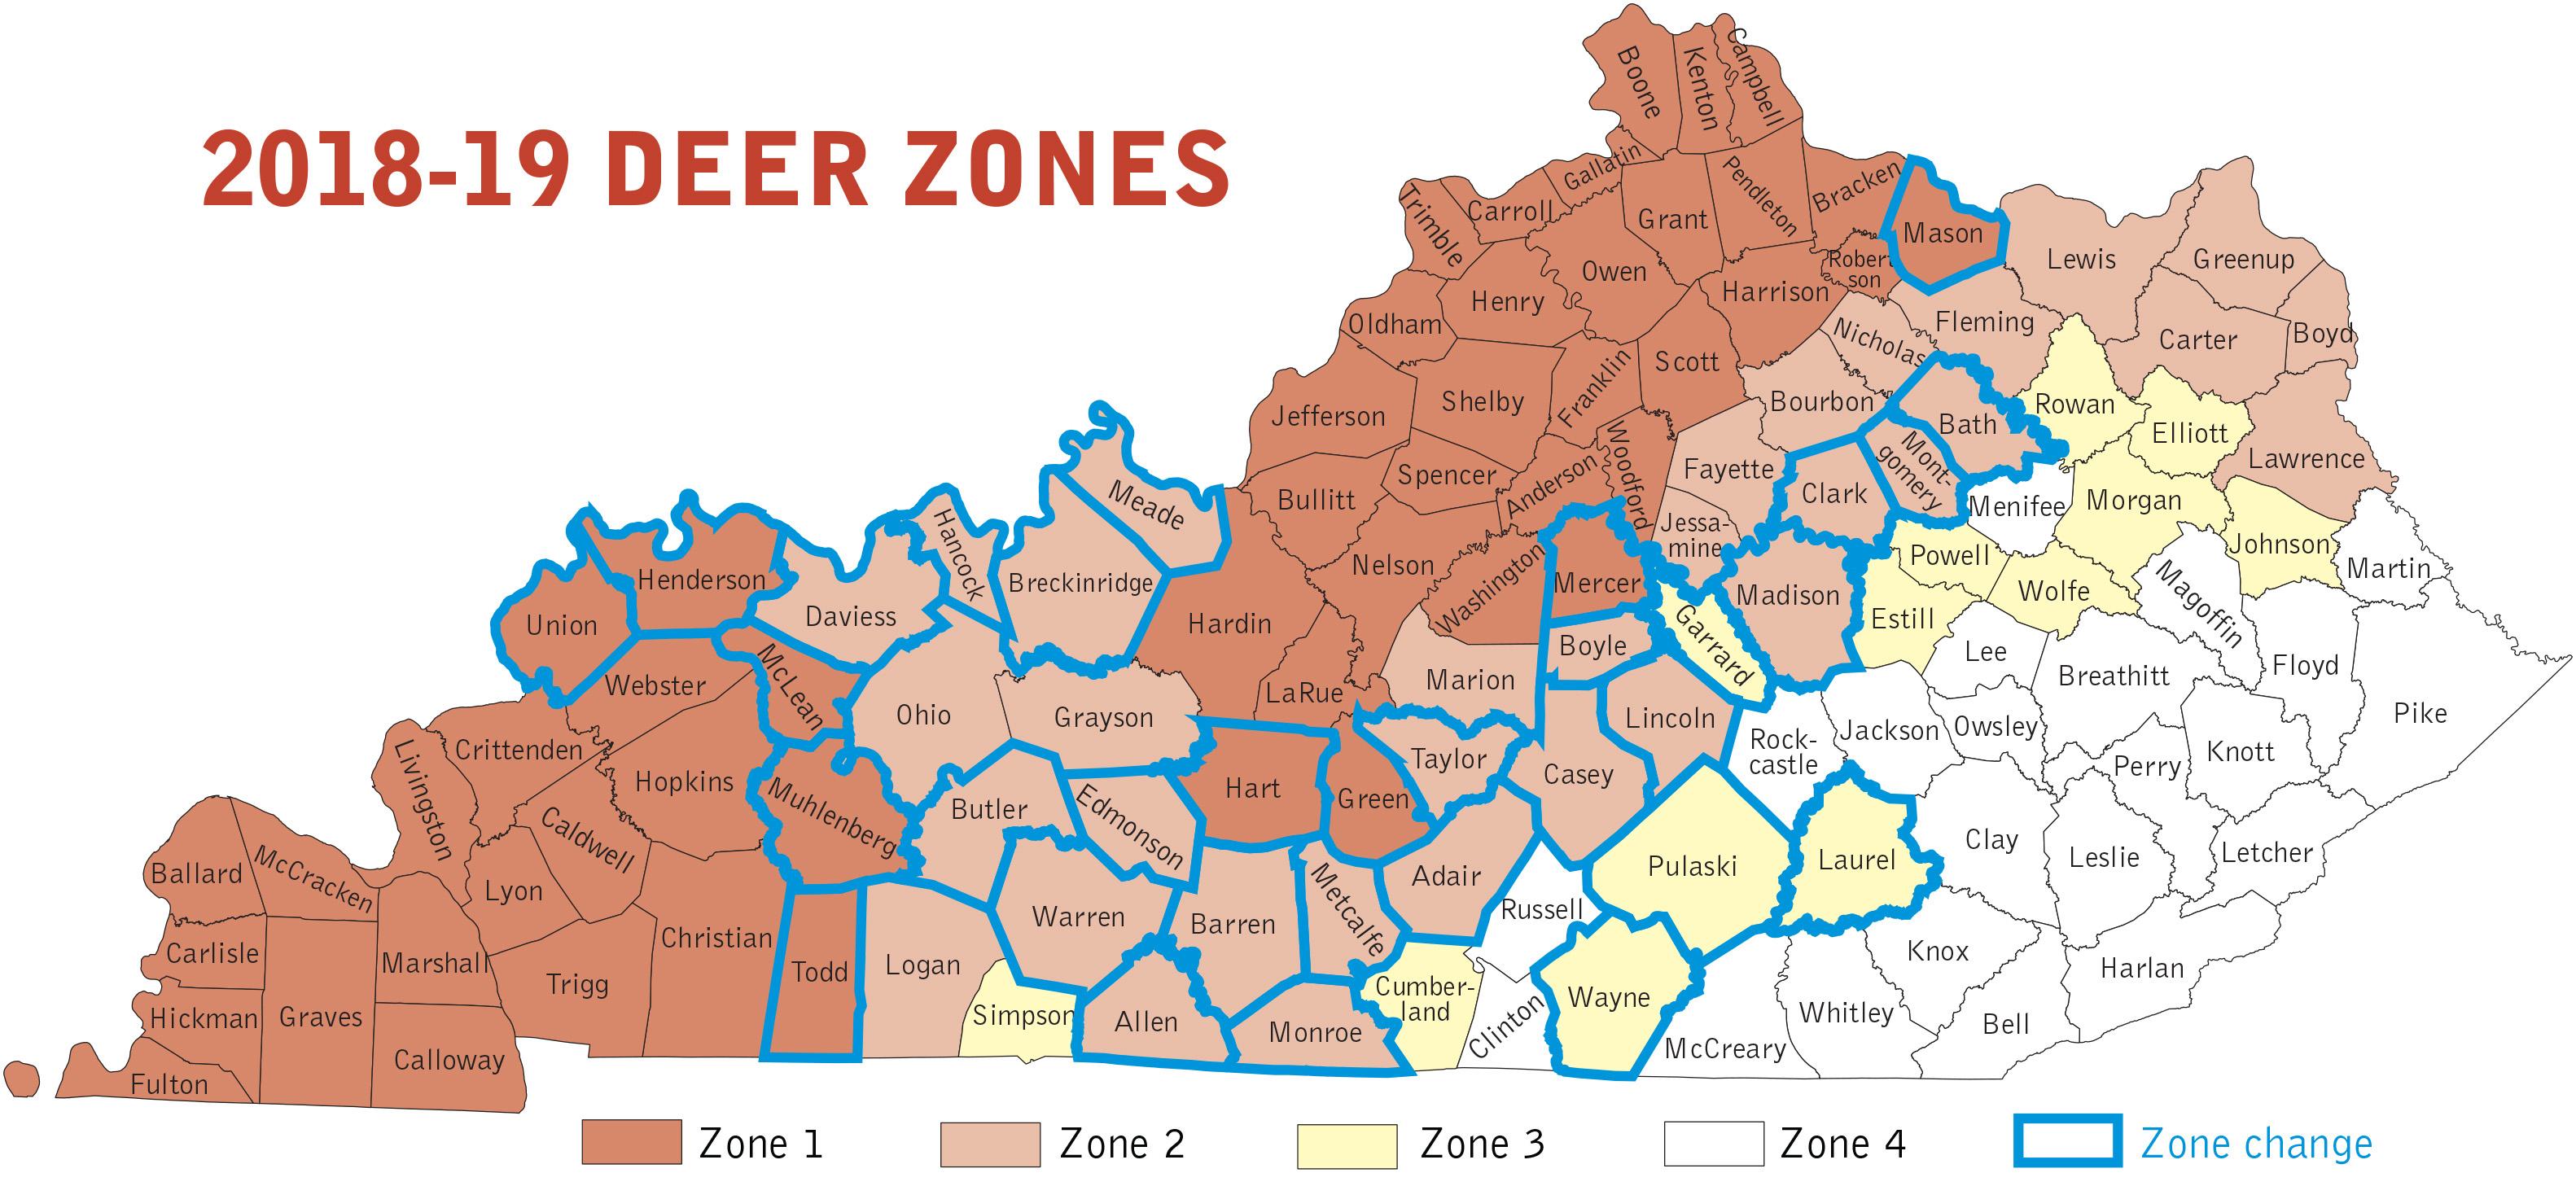 Kentucky Department Of Fish & Wildlife Deer Hunting Regulations - Deer Rut Map Texas